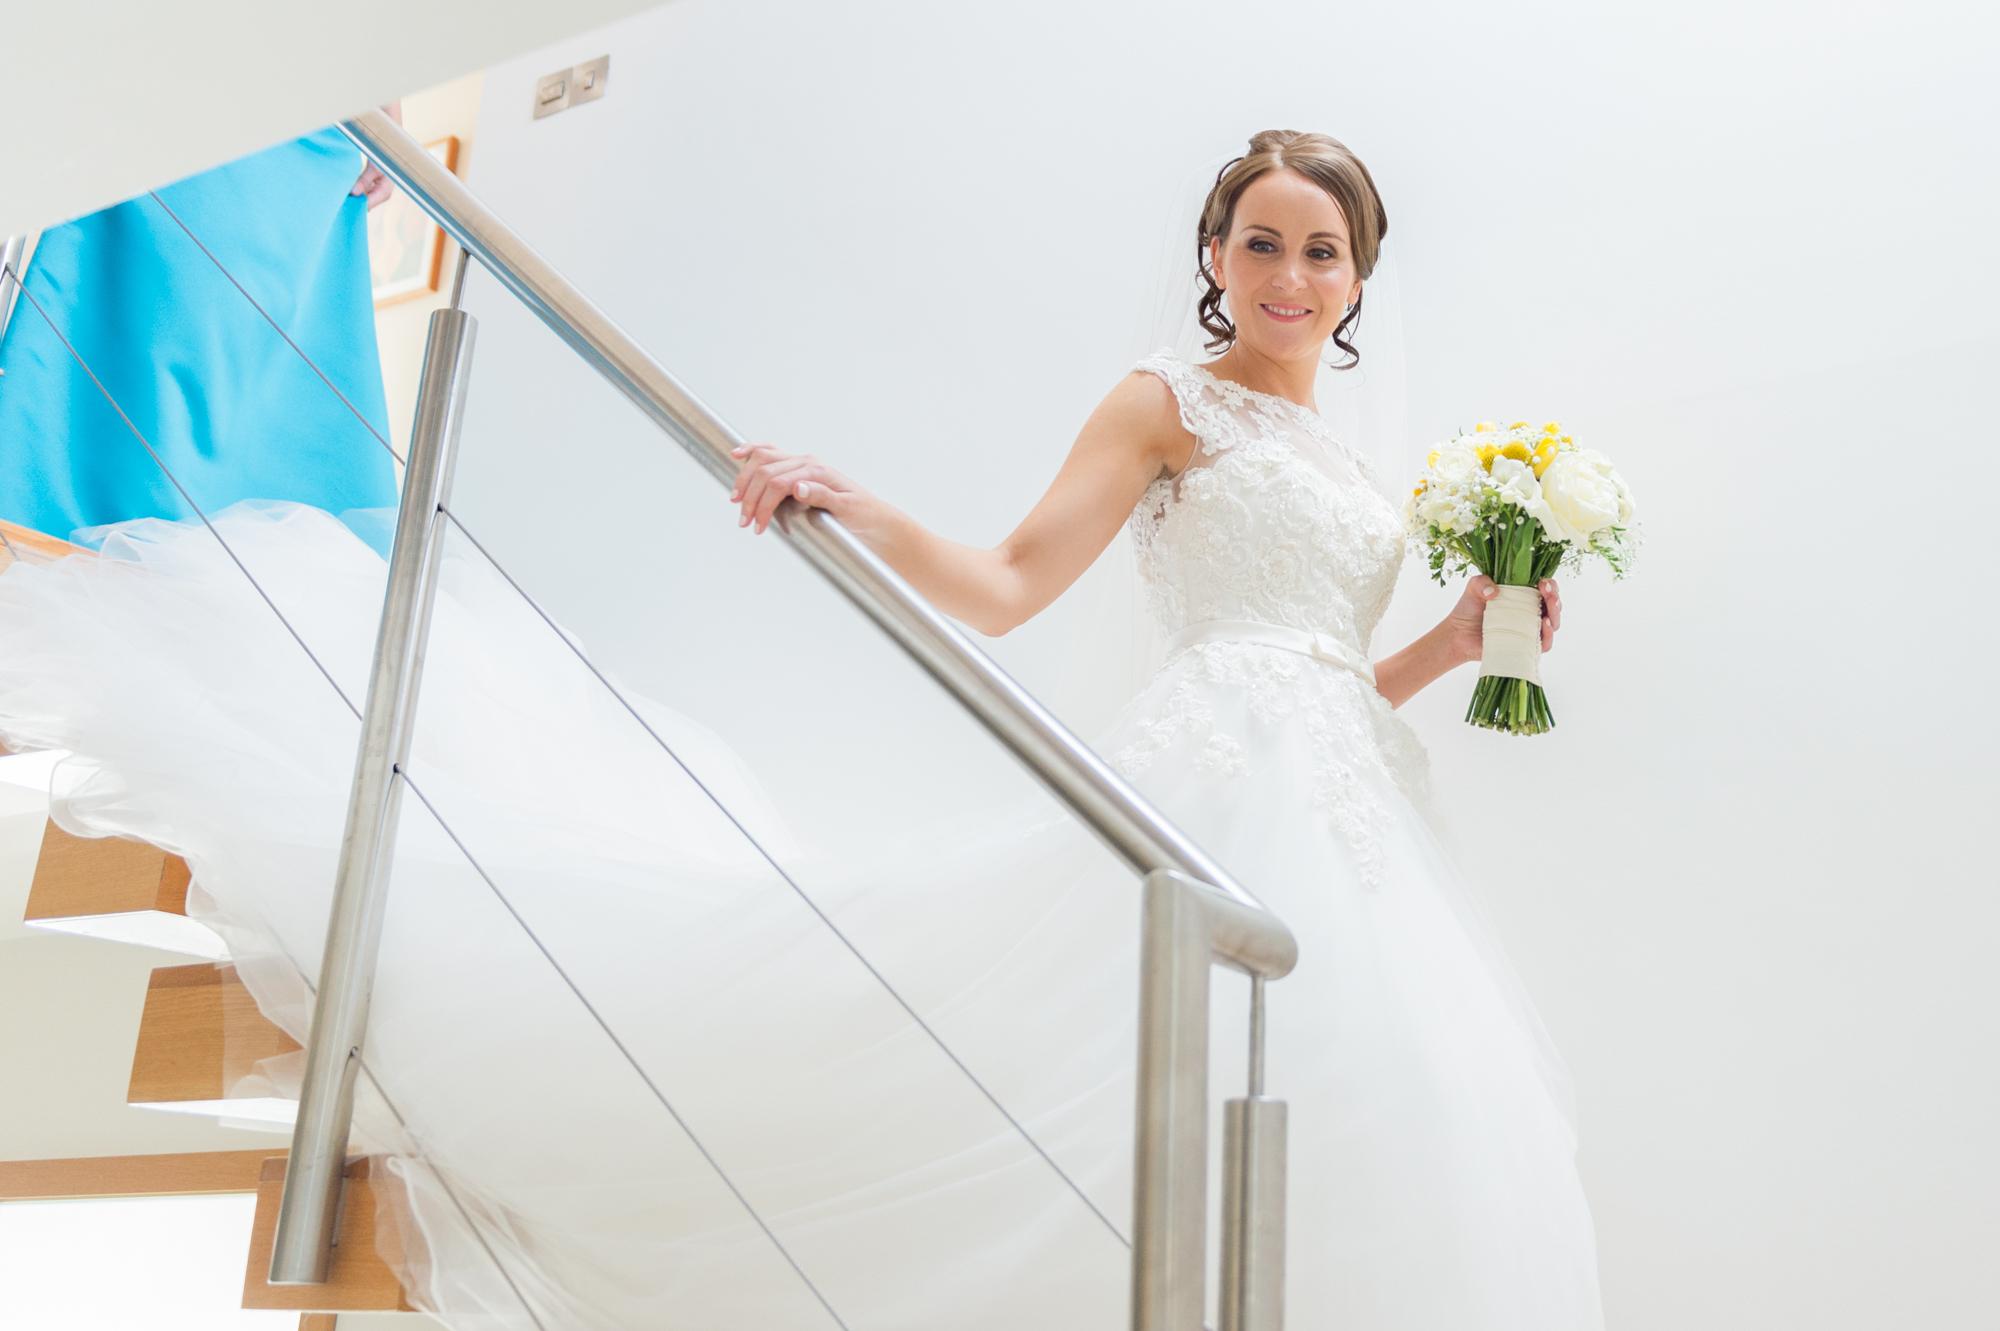 Michael_Gill_Photography_Wedding_Greencastle_Lousie_Jason_Donegal-6.jpg